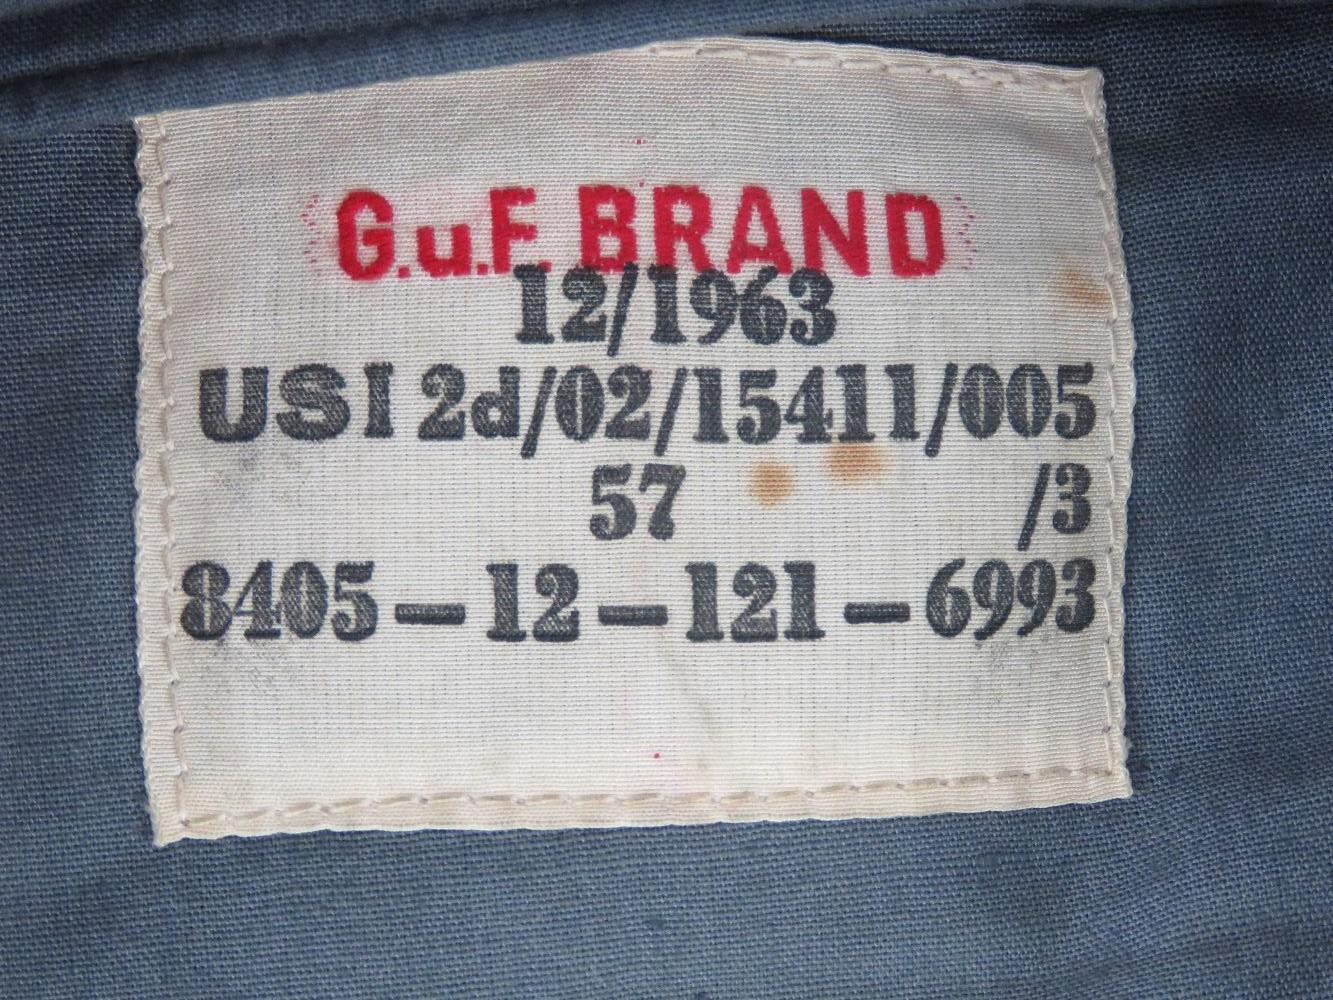 An East German blue cloth side cap havin - Image 2 of 2